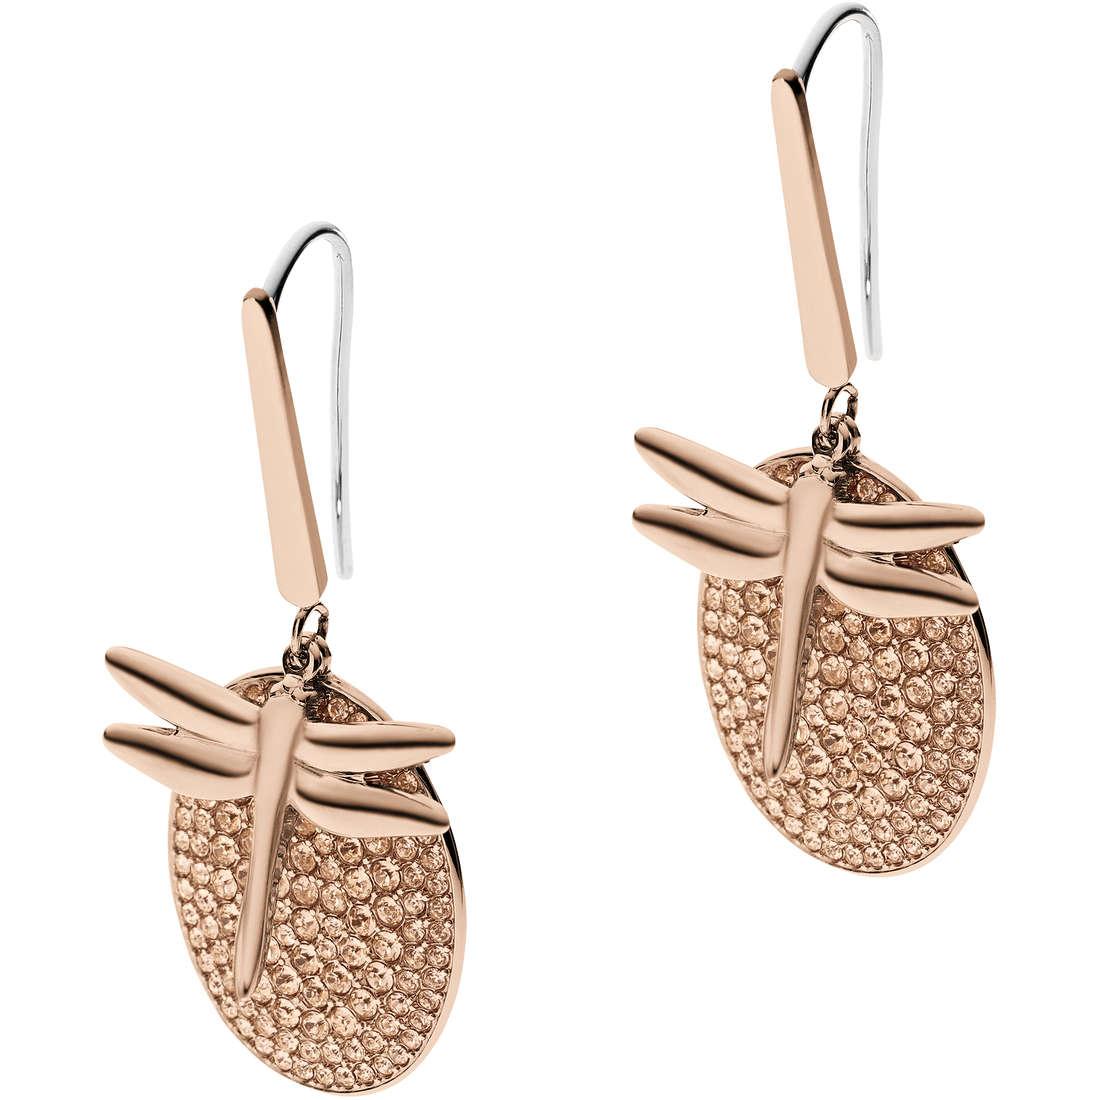 ear-rings woman jewellery Emporio Armani Fall 2013 EGS1784221